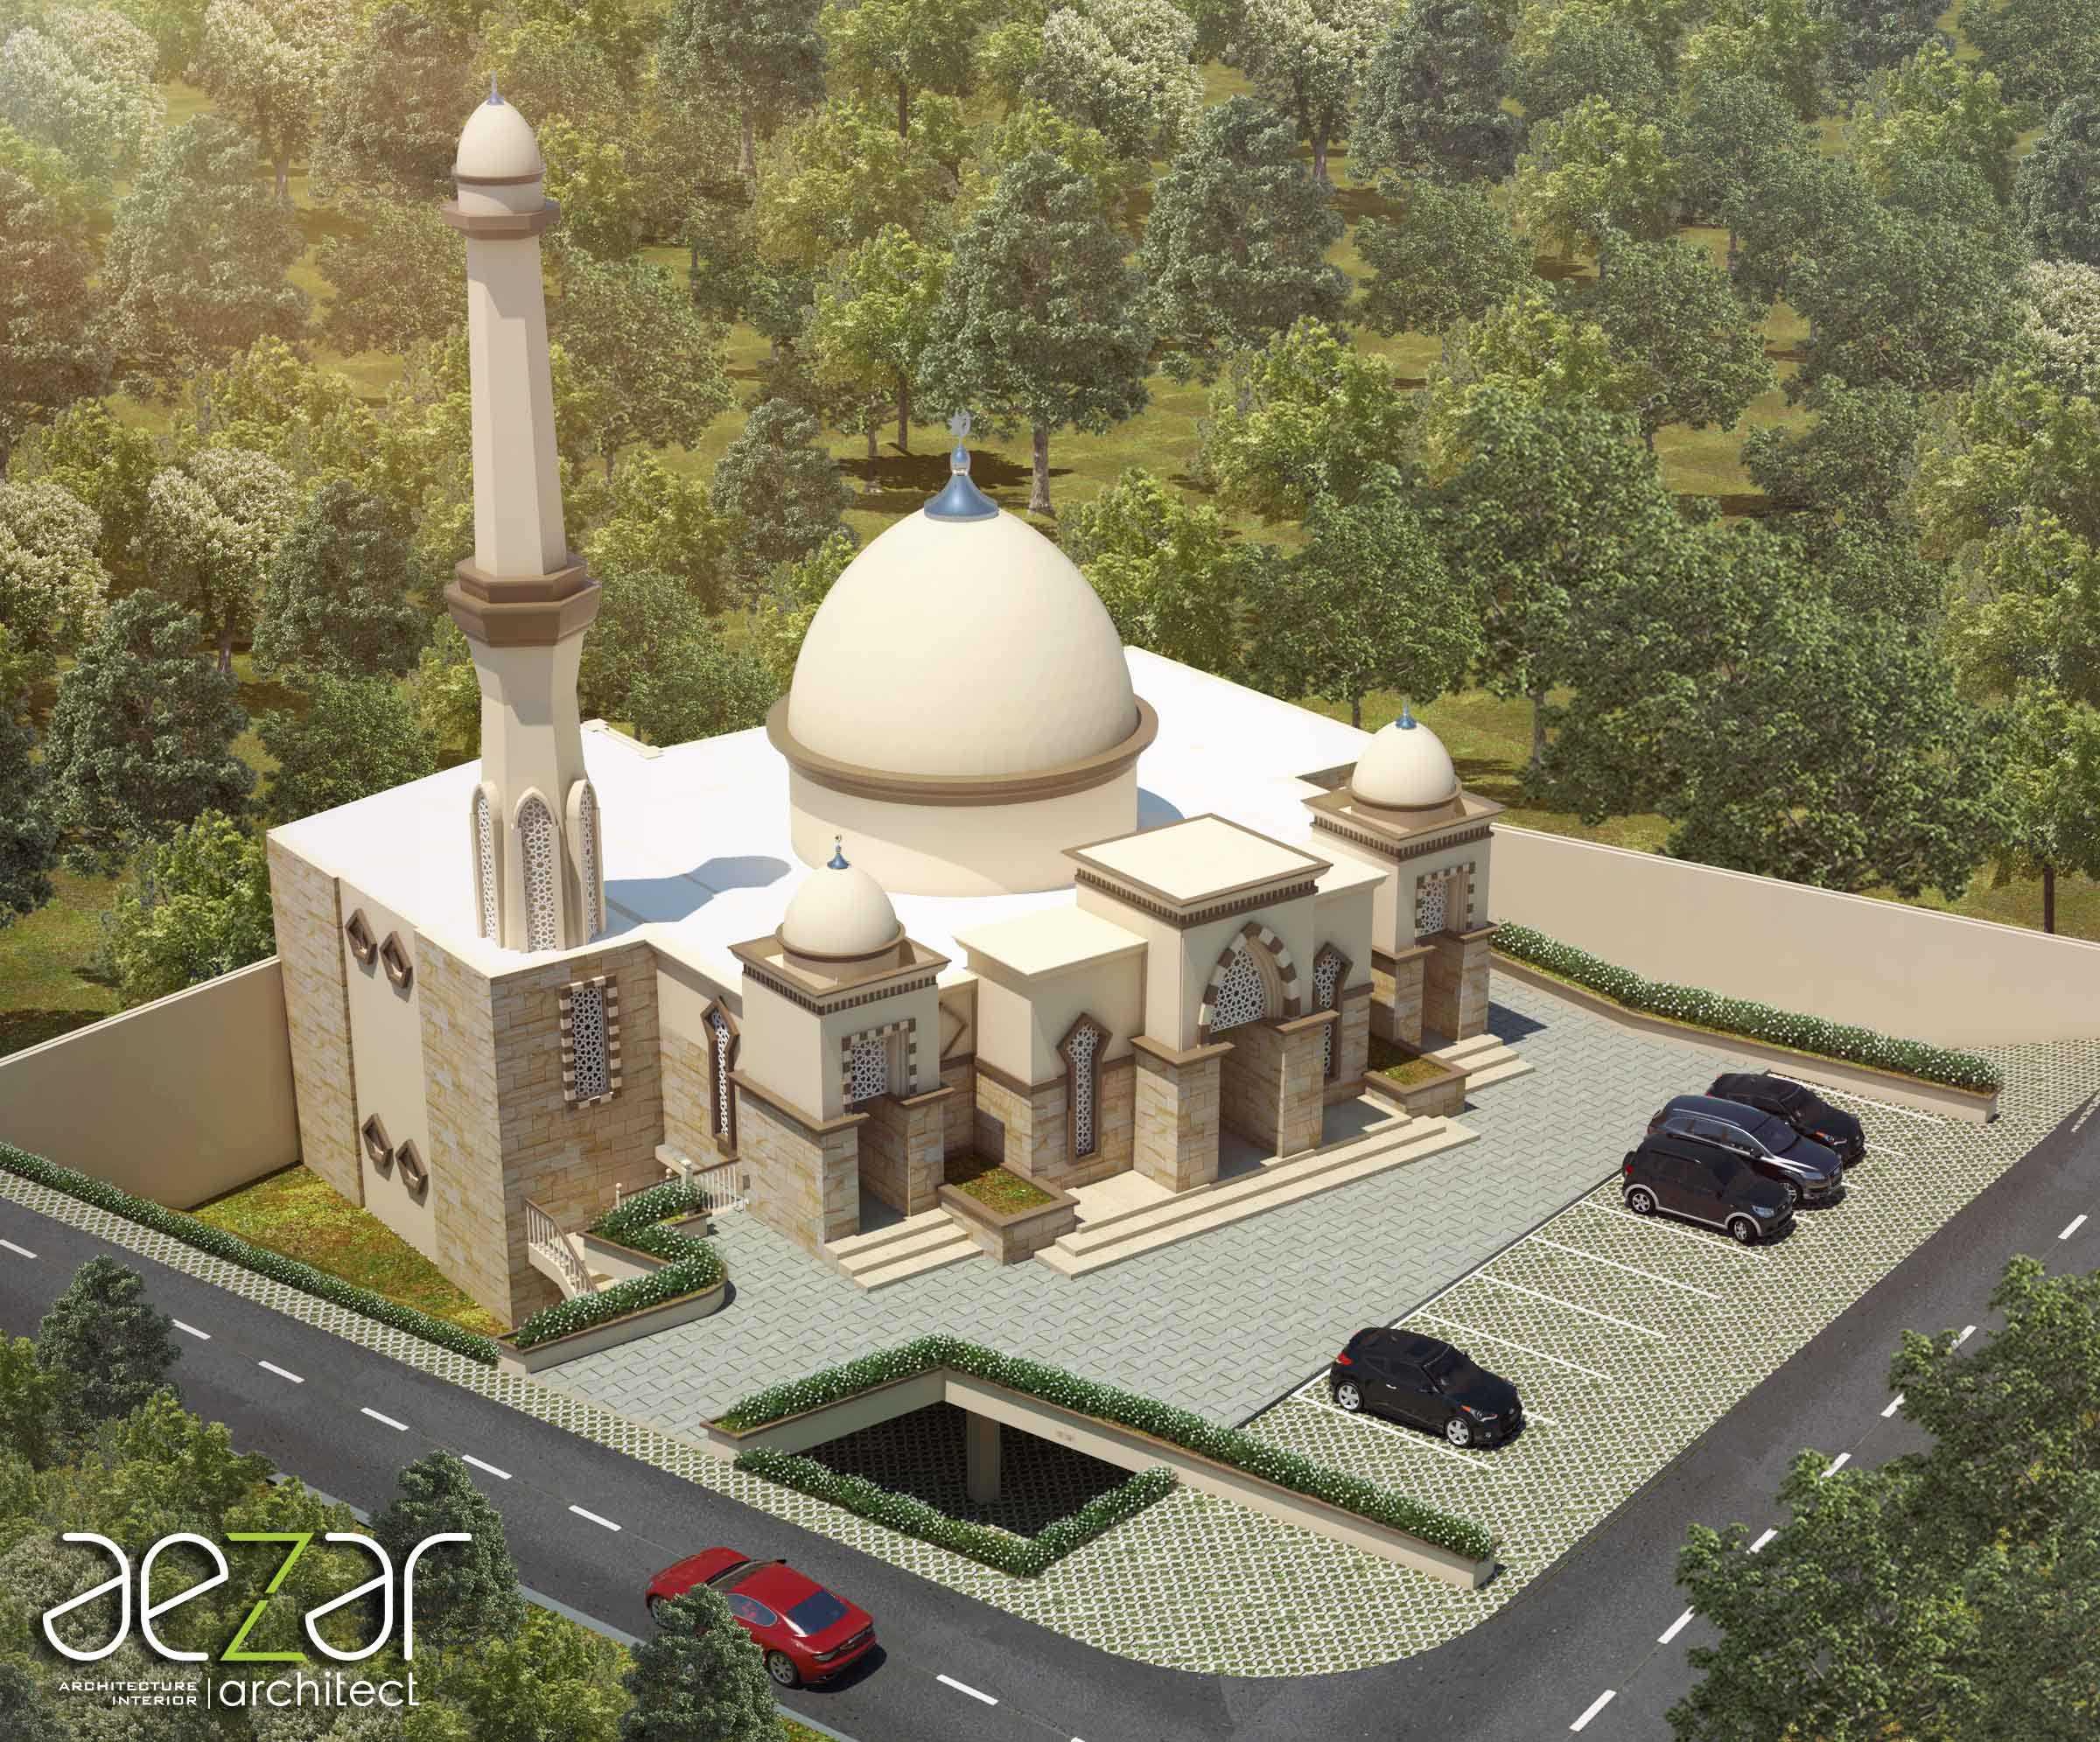 Aezar Architect Baitussalam Mosque Kabupaten Sragen, Jawa Tengah, Indonesia Kabupaten Sragen, Jawa Tengah, Indonesia Bird Eye View   54437